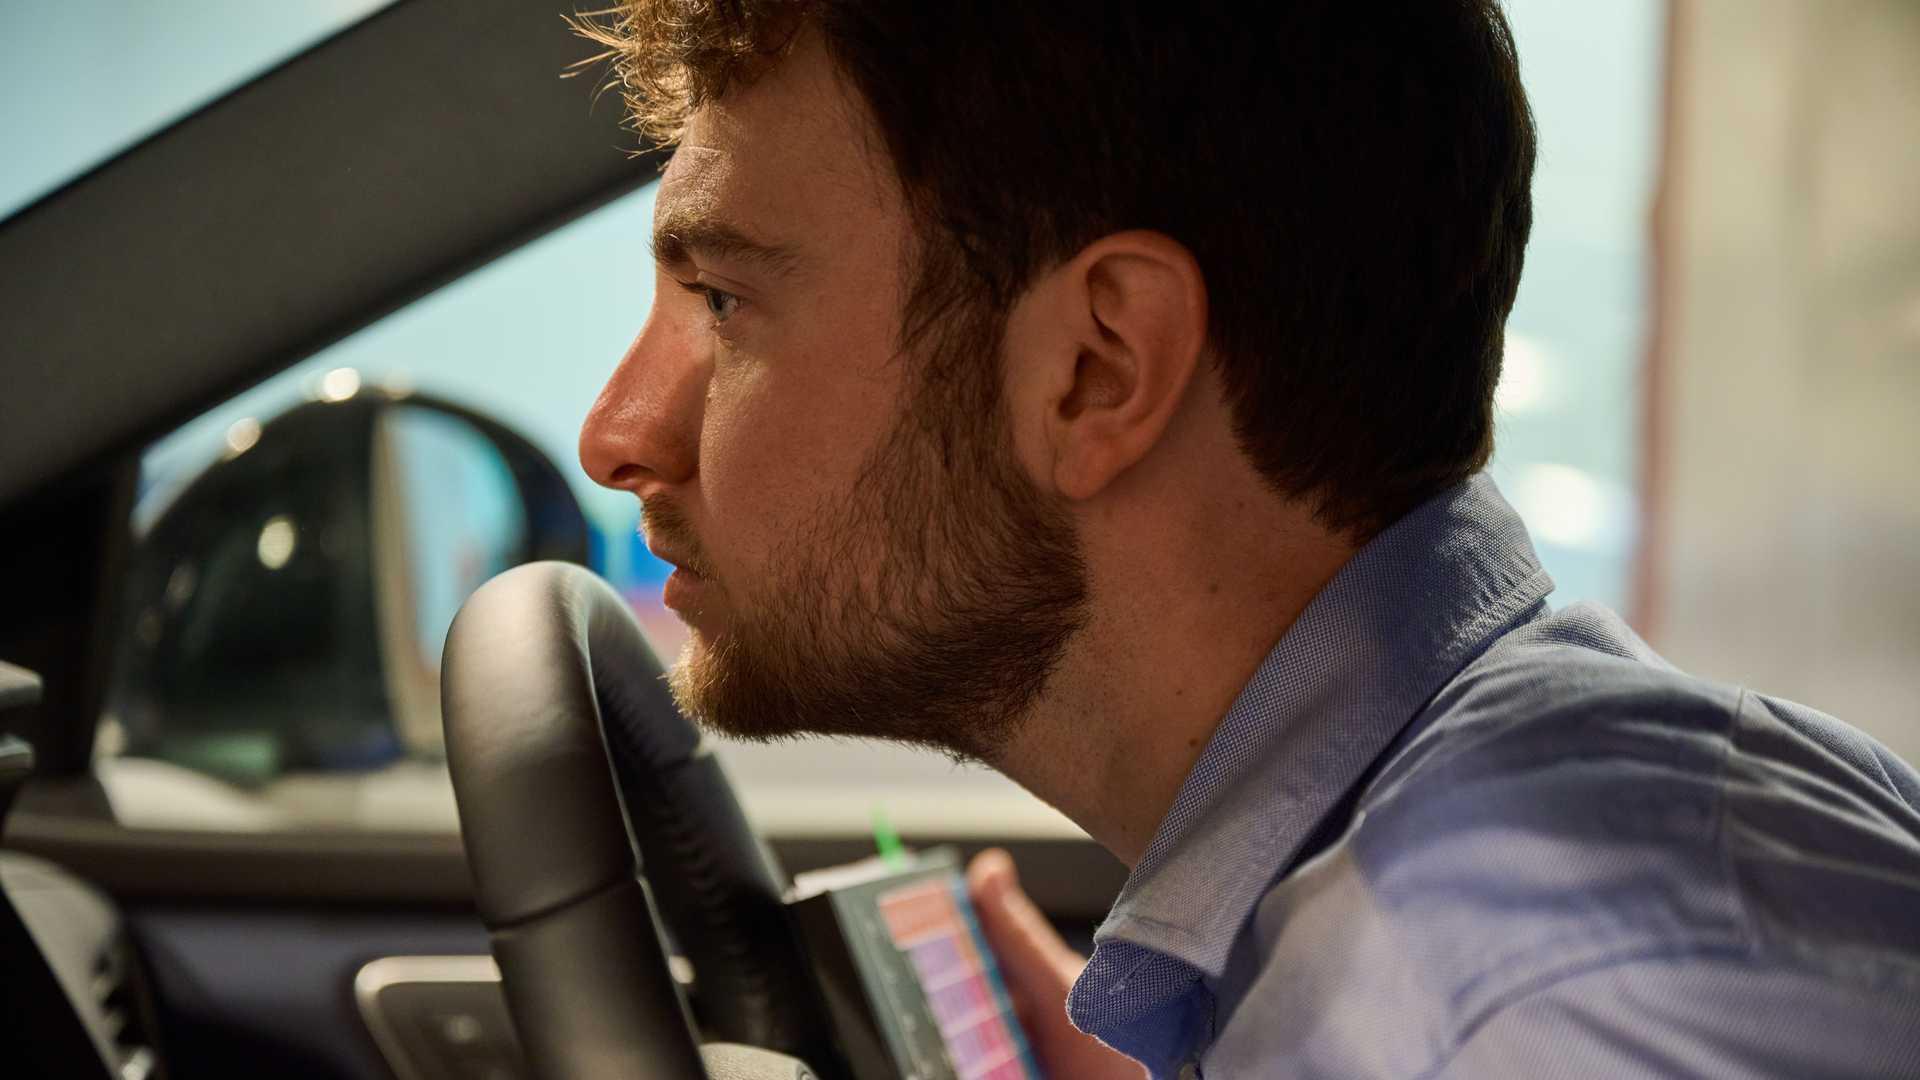 https://cdn.motor1.com/images/mgl/QjAQ9/s6/nissan-new-car-smell-steering-wheel.jpg